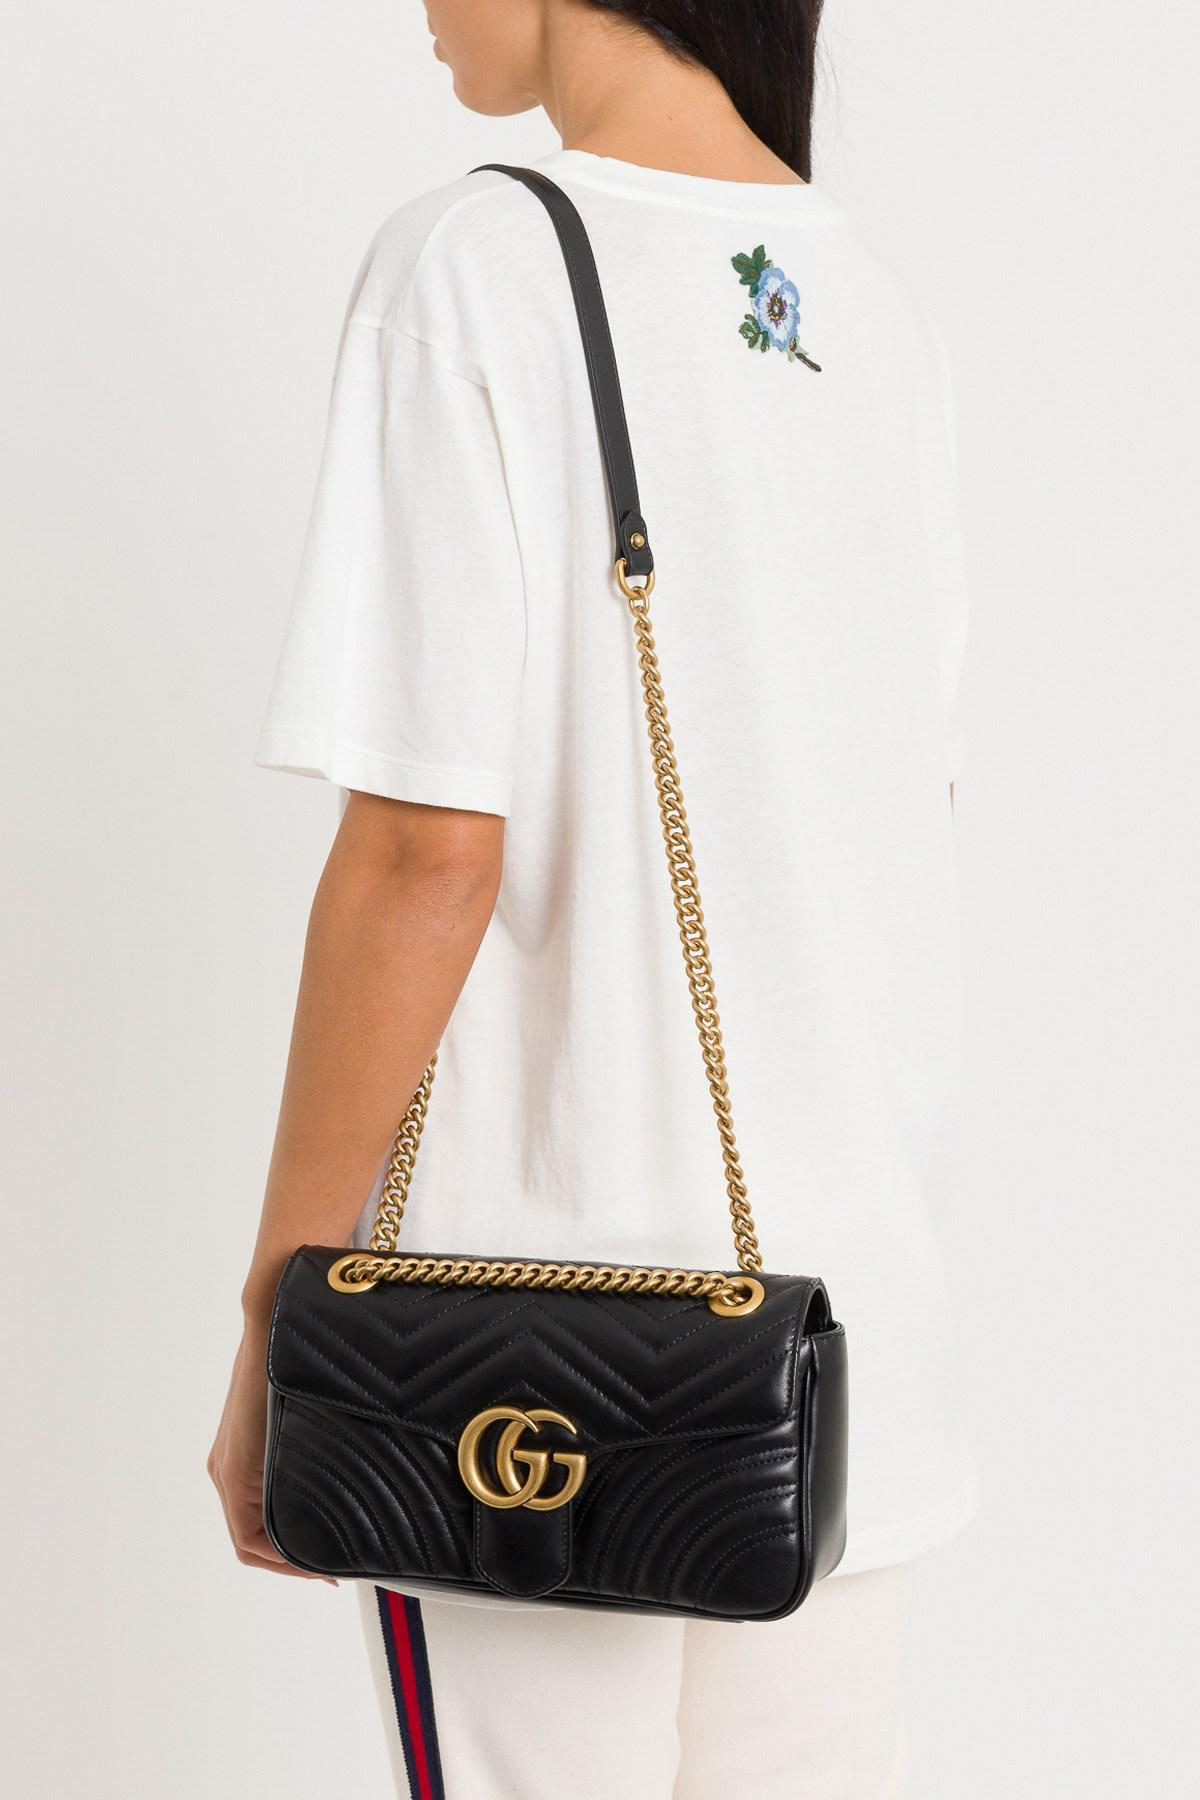 7f11c395c86dc3 Gucci Gg Marmont Small Matelassé Shoulder Bag - Lyst